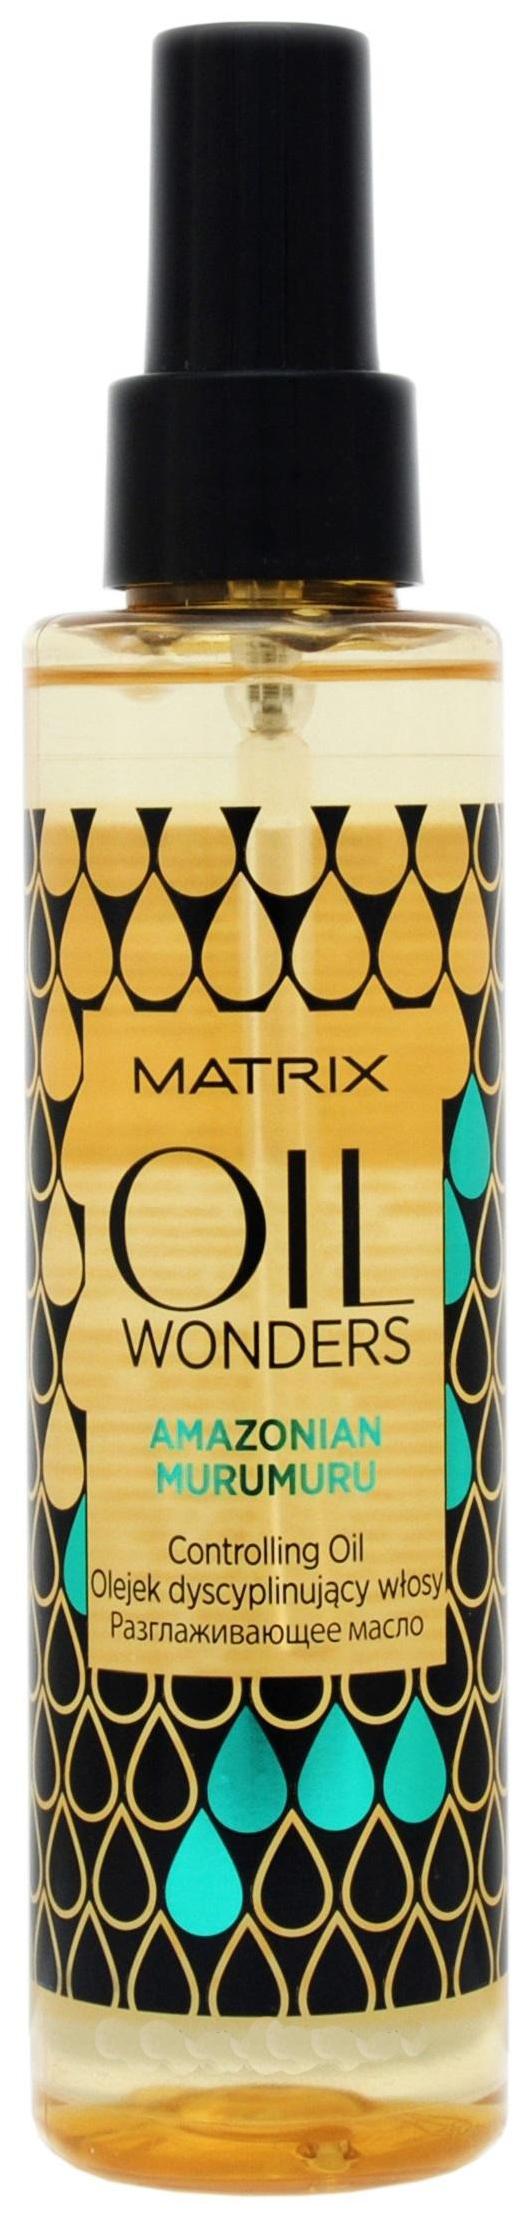 Масло для волос Matrix Oil Wonders Amazonian Murumuru 125 мл